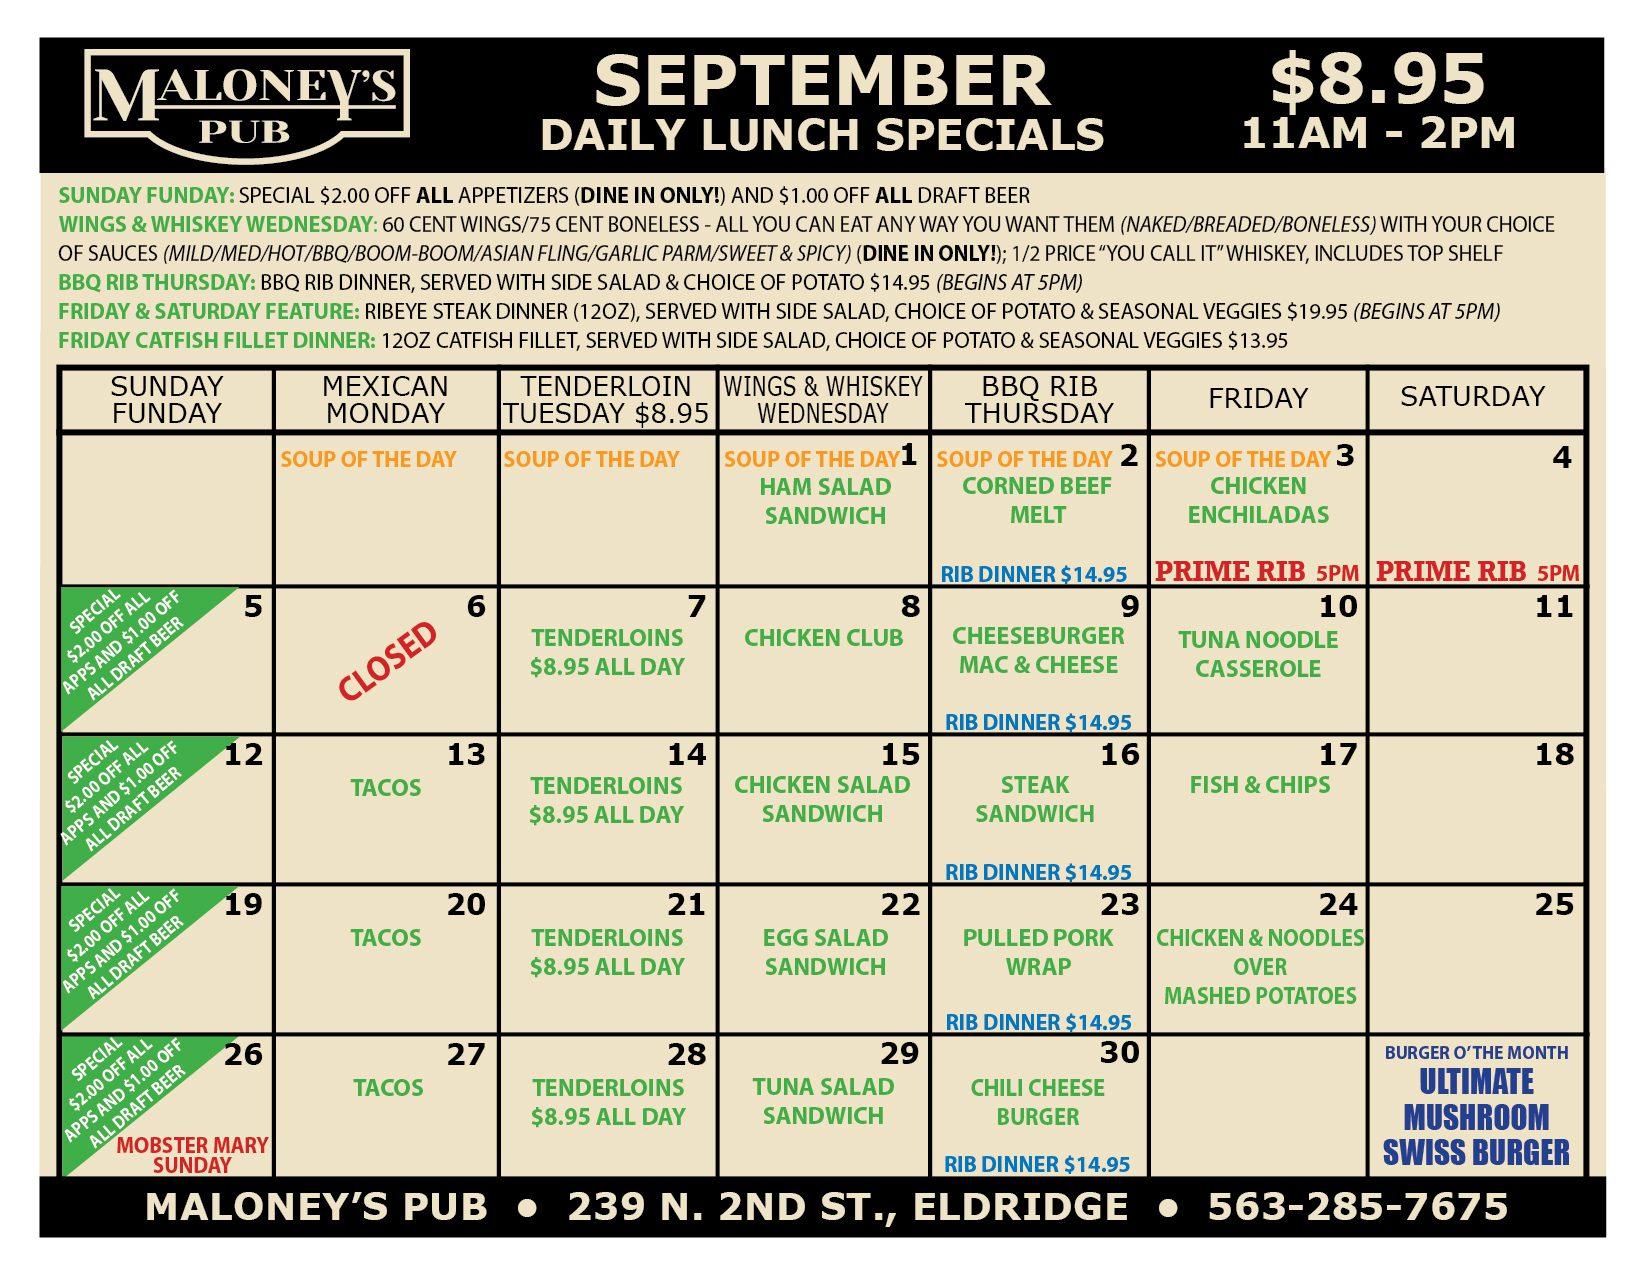 Maloneys-Pub-August-2021-Lunch-Specials